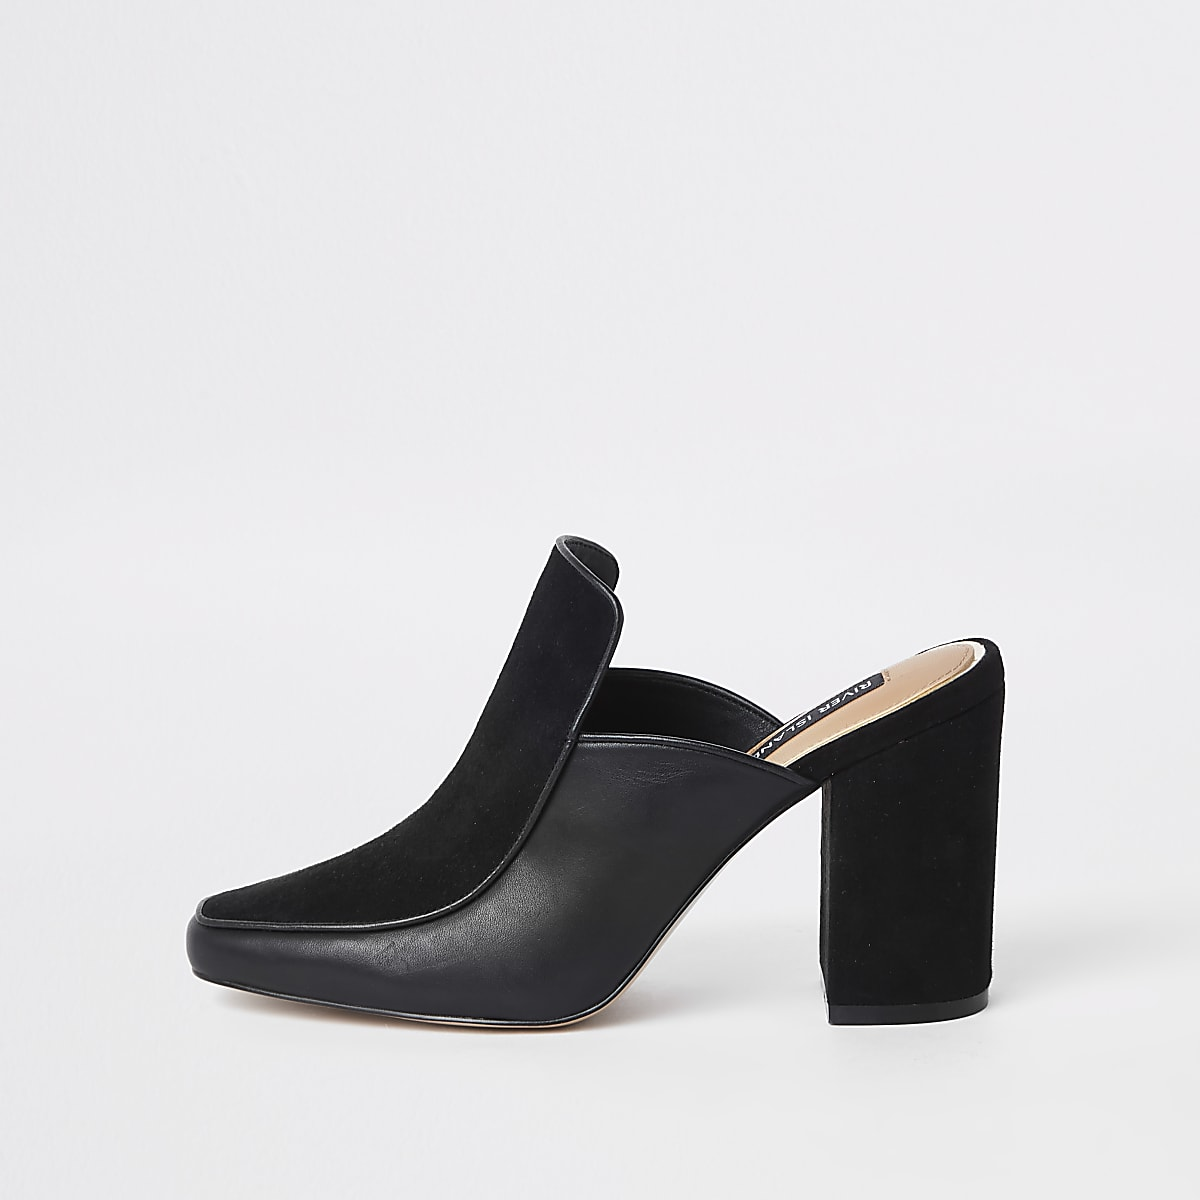 Black leather square toe mule